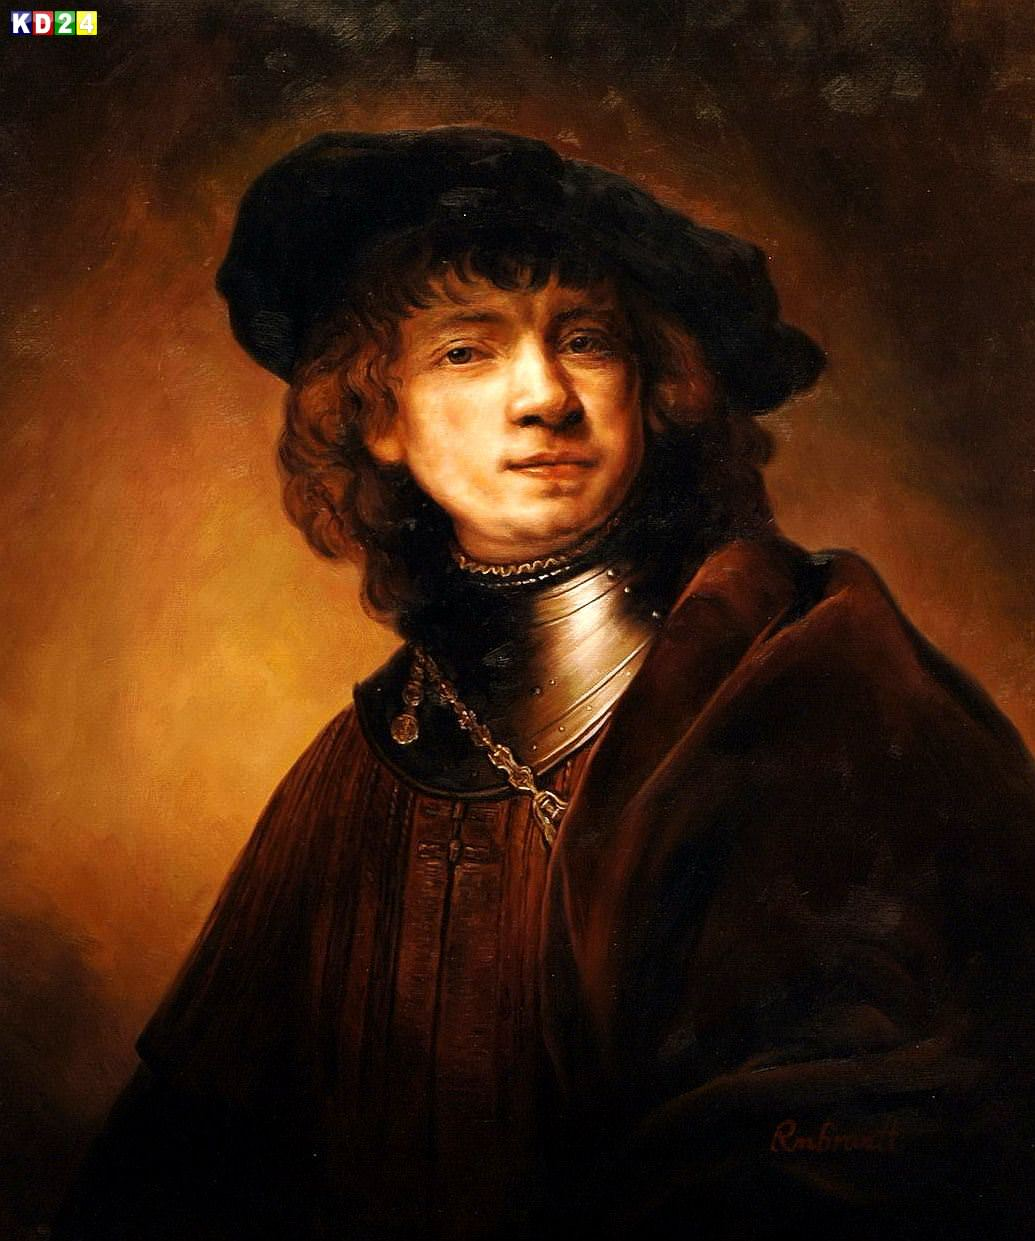 Rembrandt - Selbstportrait als junger Mann c81952 50x60cm exzellentes Ölgemälde Museumsqualität